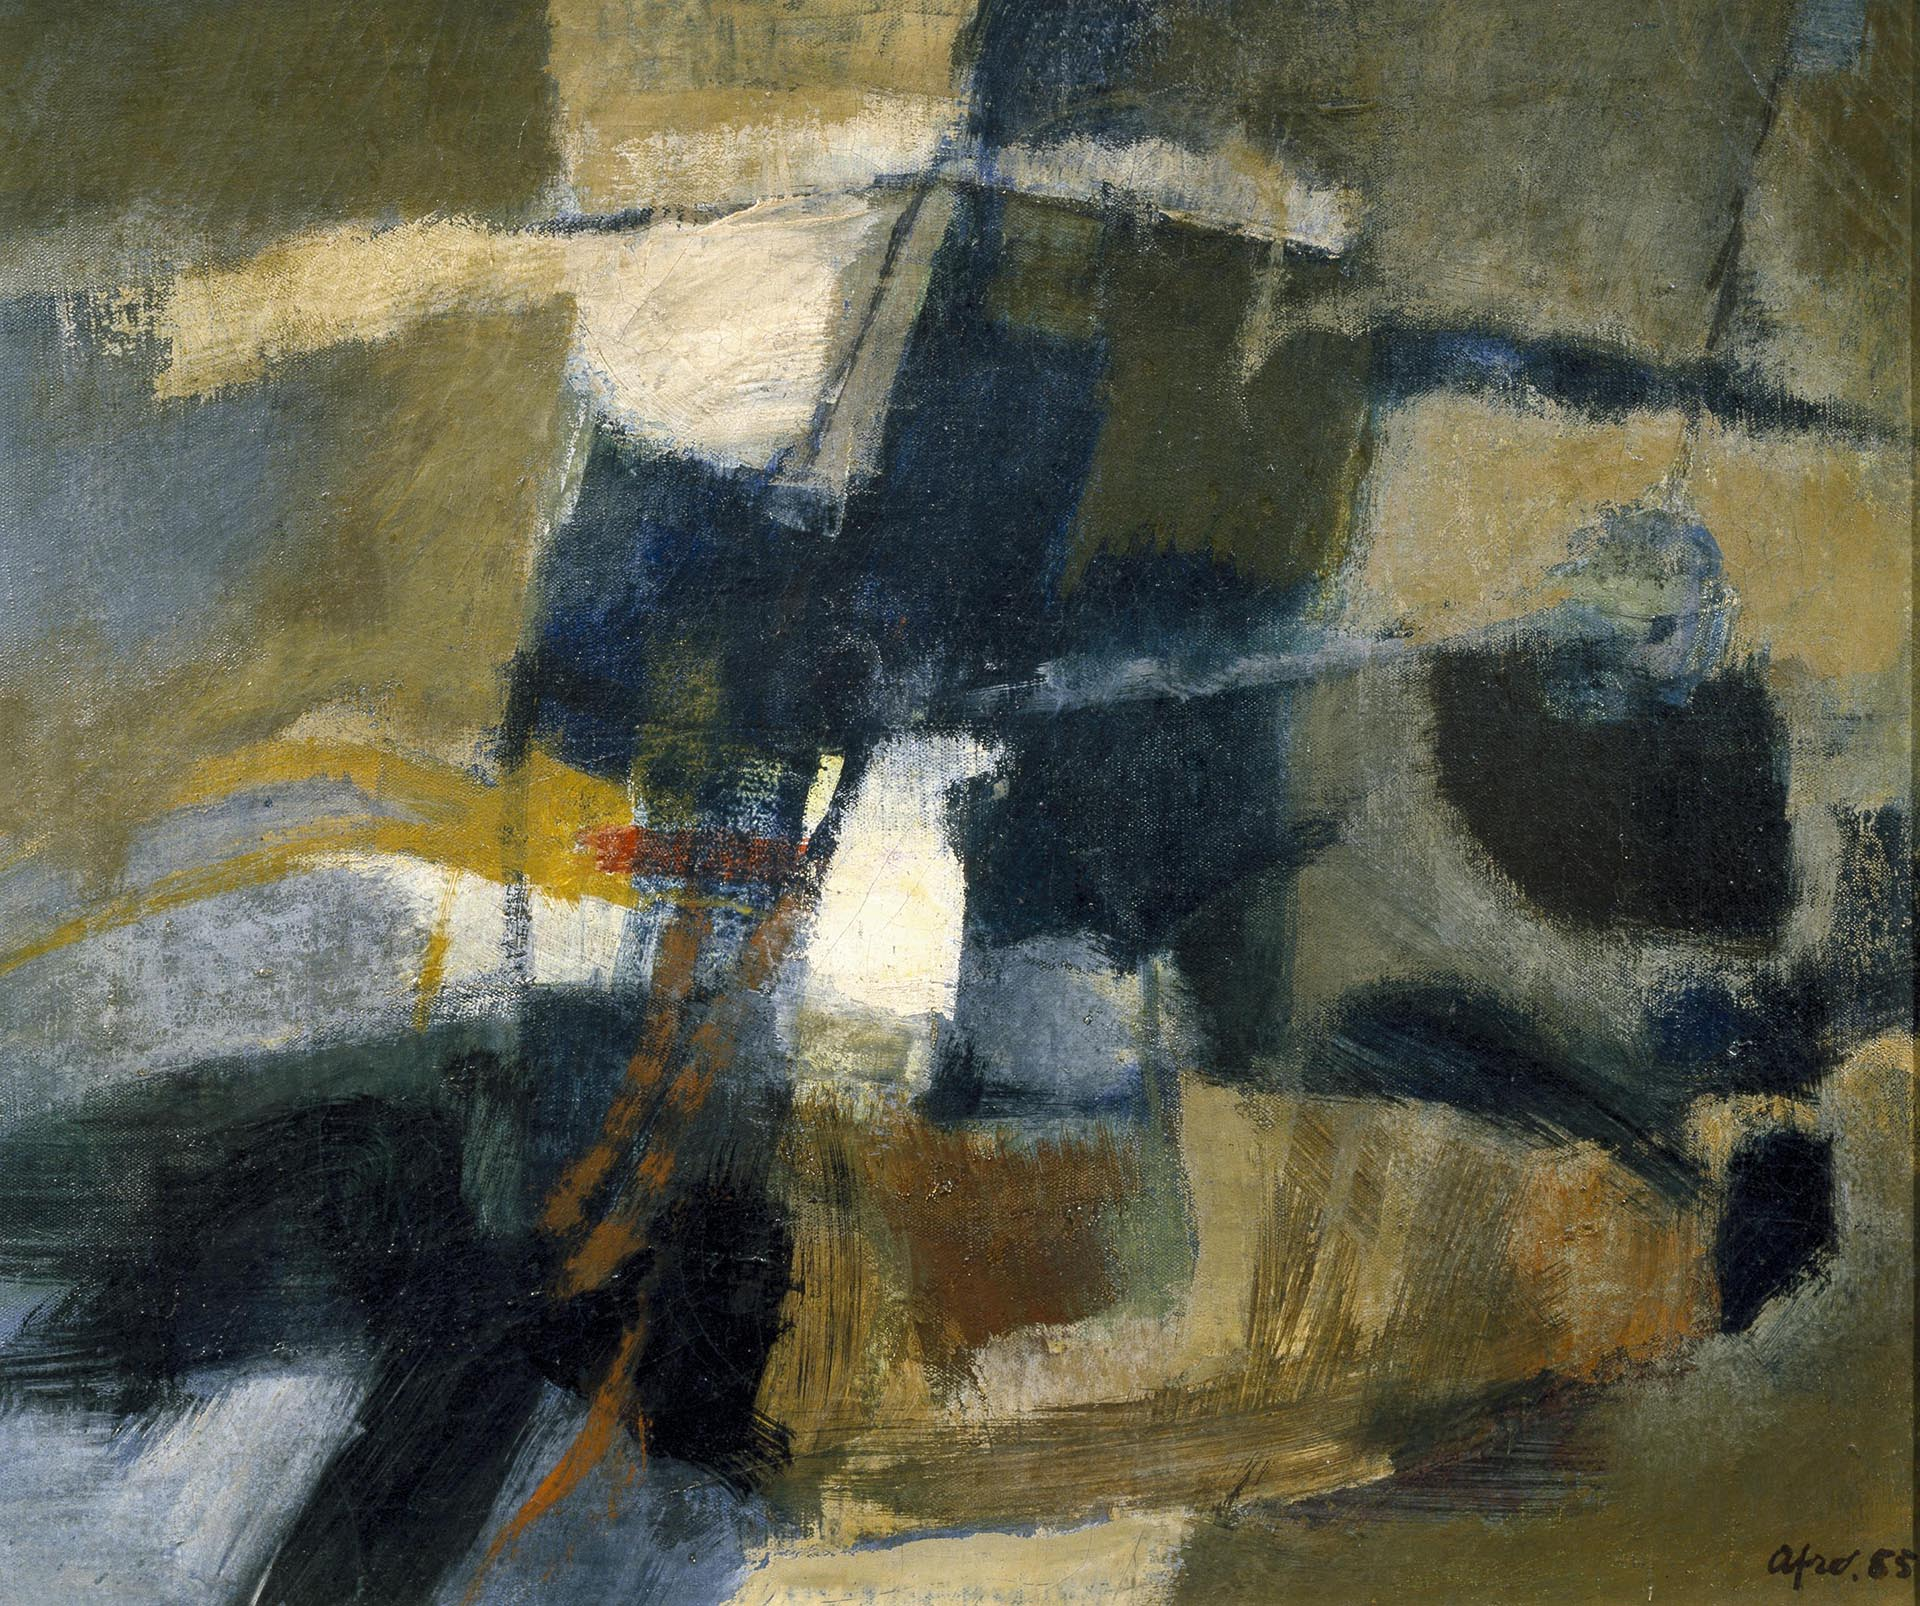 Afro, Senza titolo, 1955, 50x60 cm